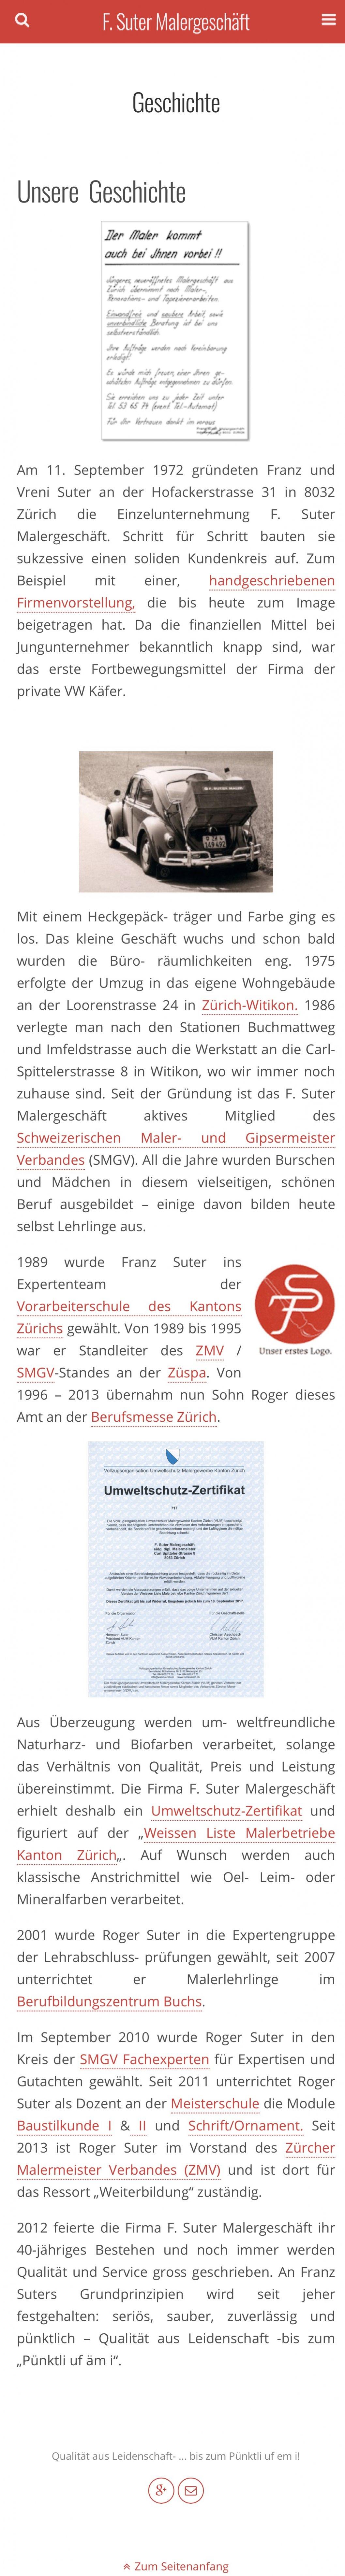 Geschichte-Mobile-classic.jpg